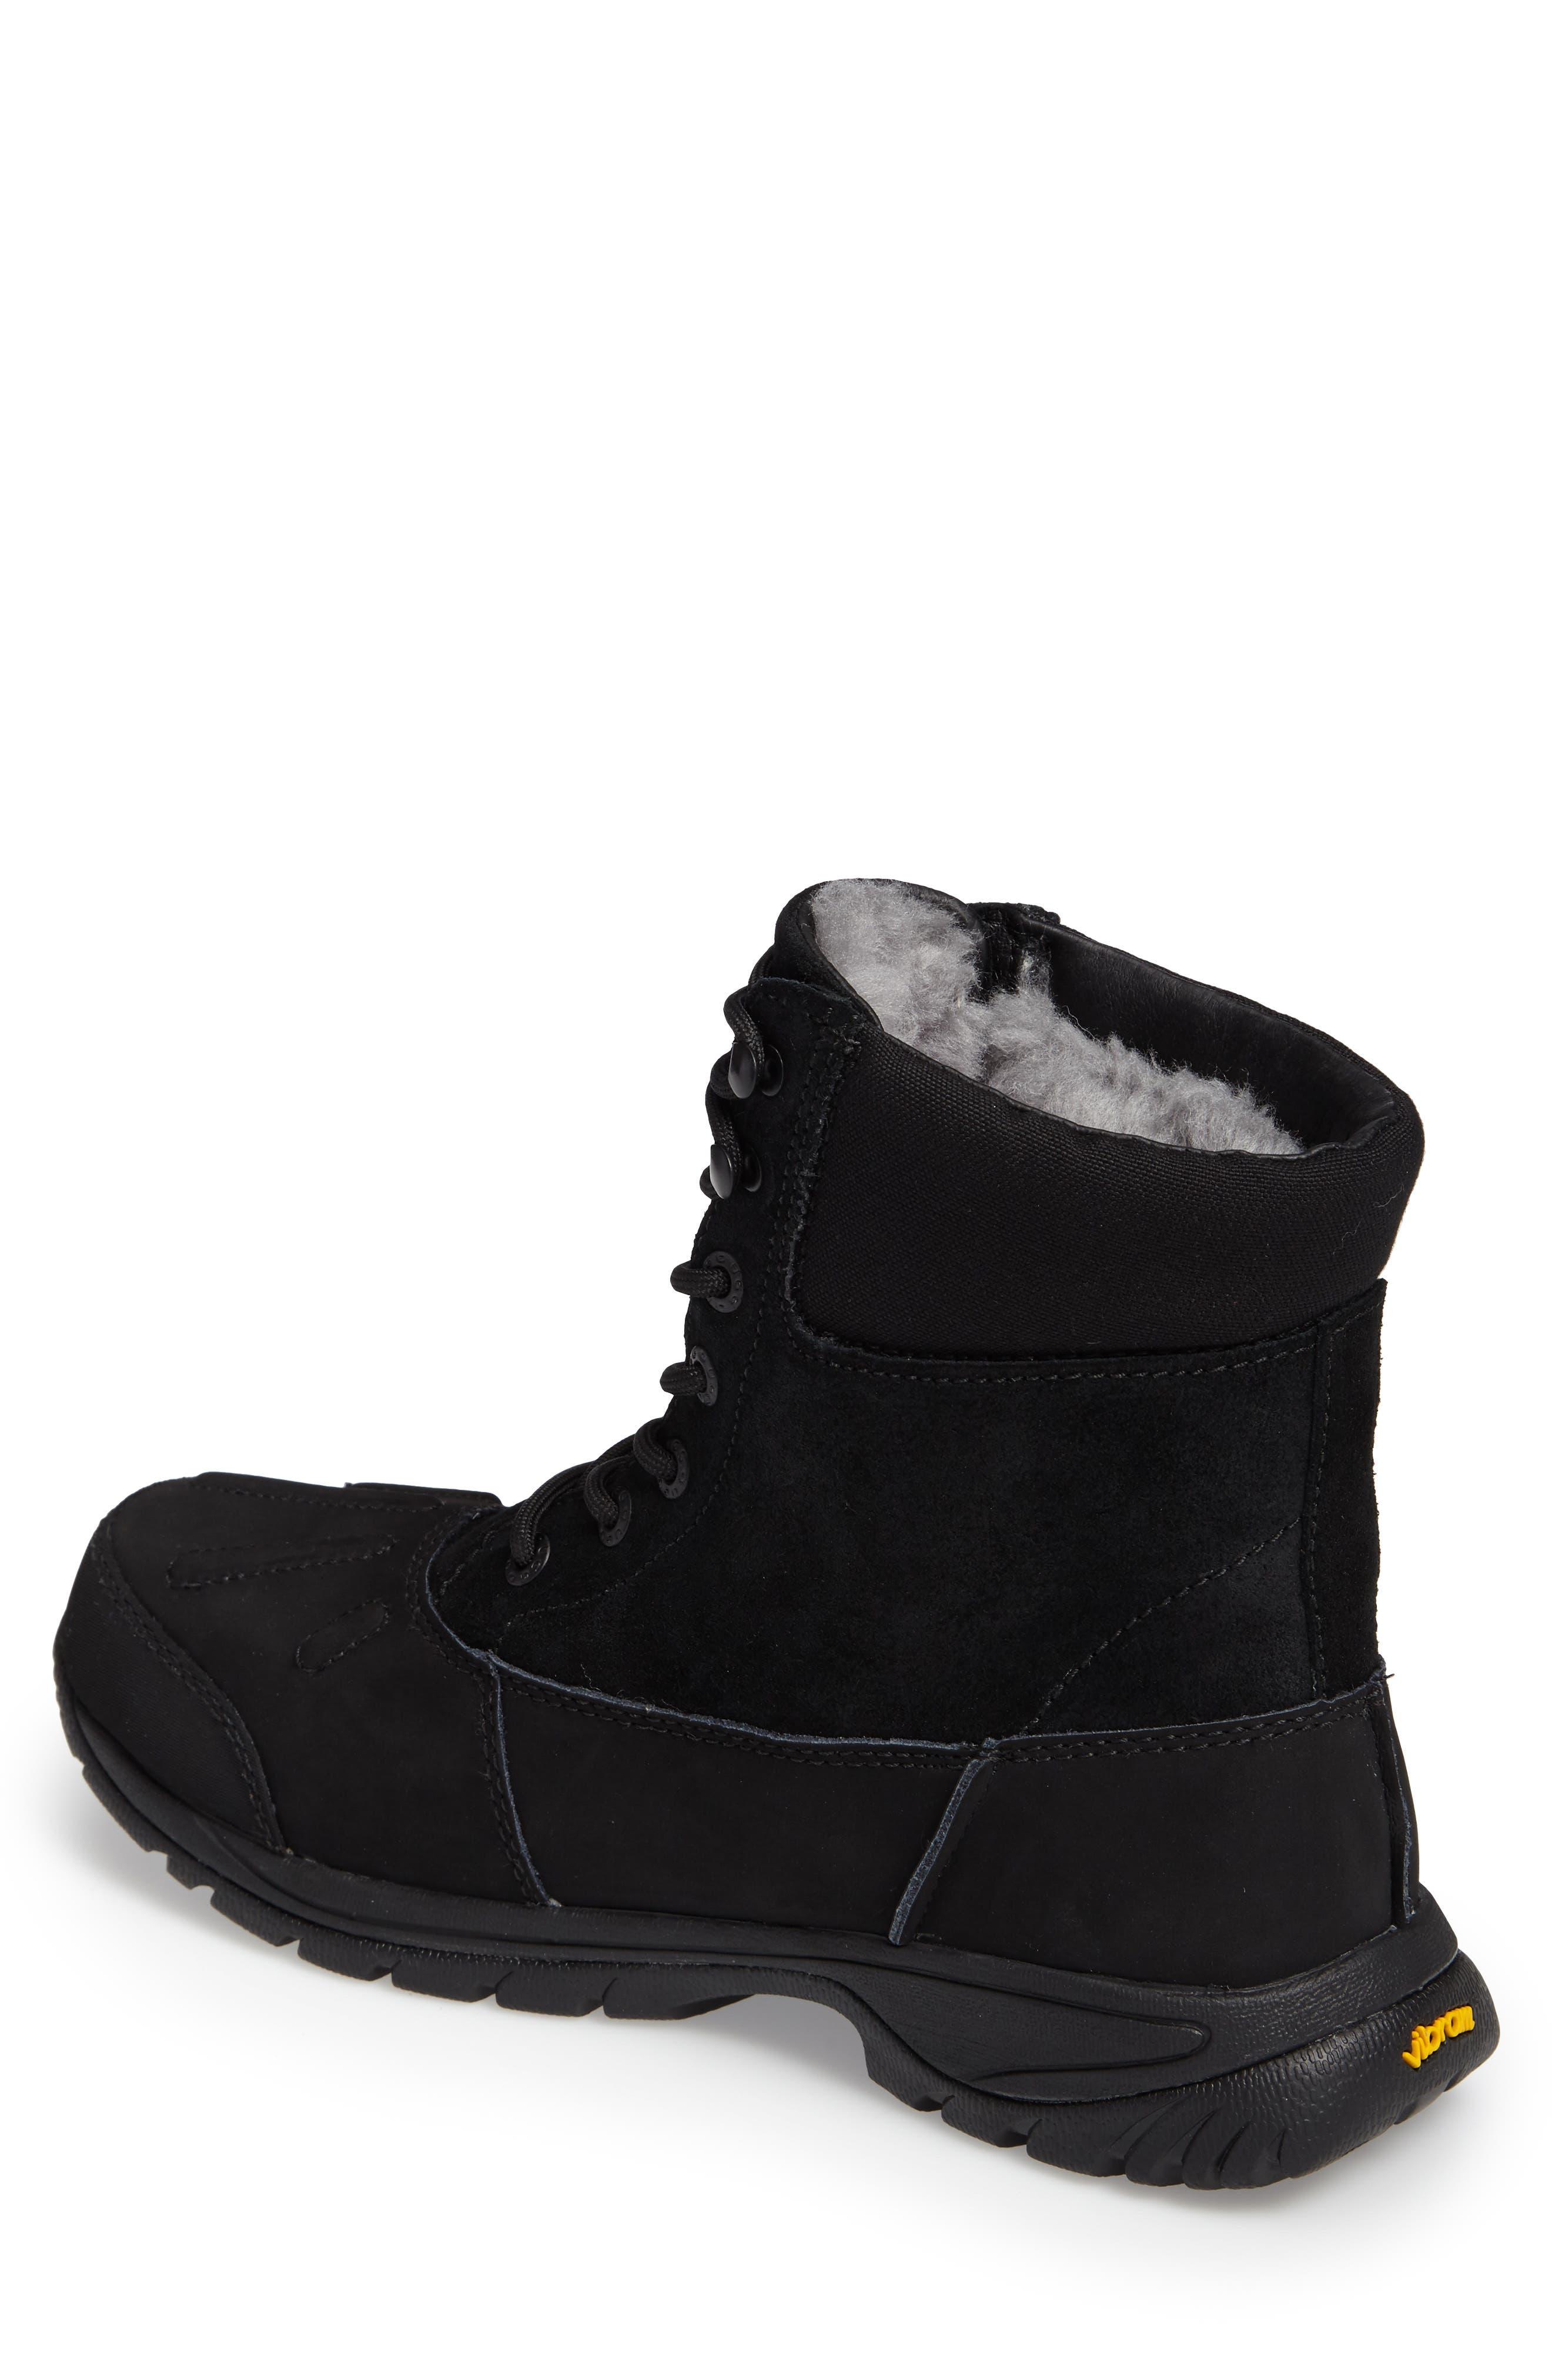 'Metcalf' Snow Boot,                             Alternate thumbnail 2, color,                             001